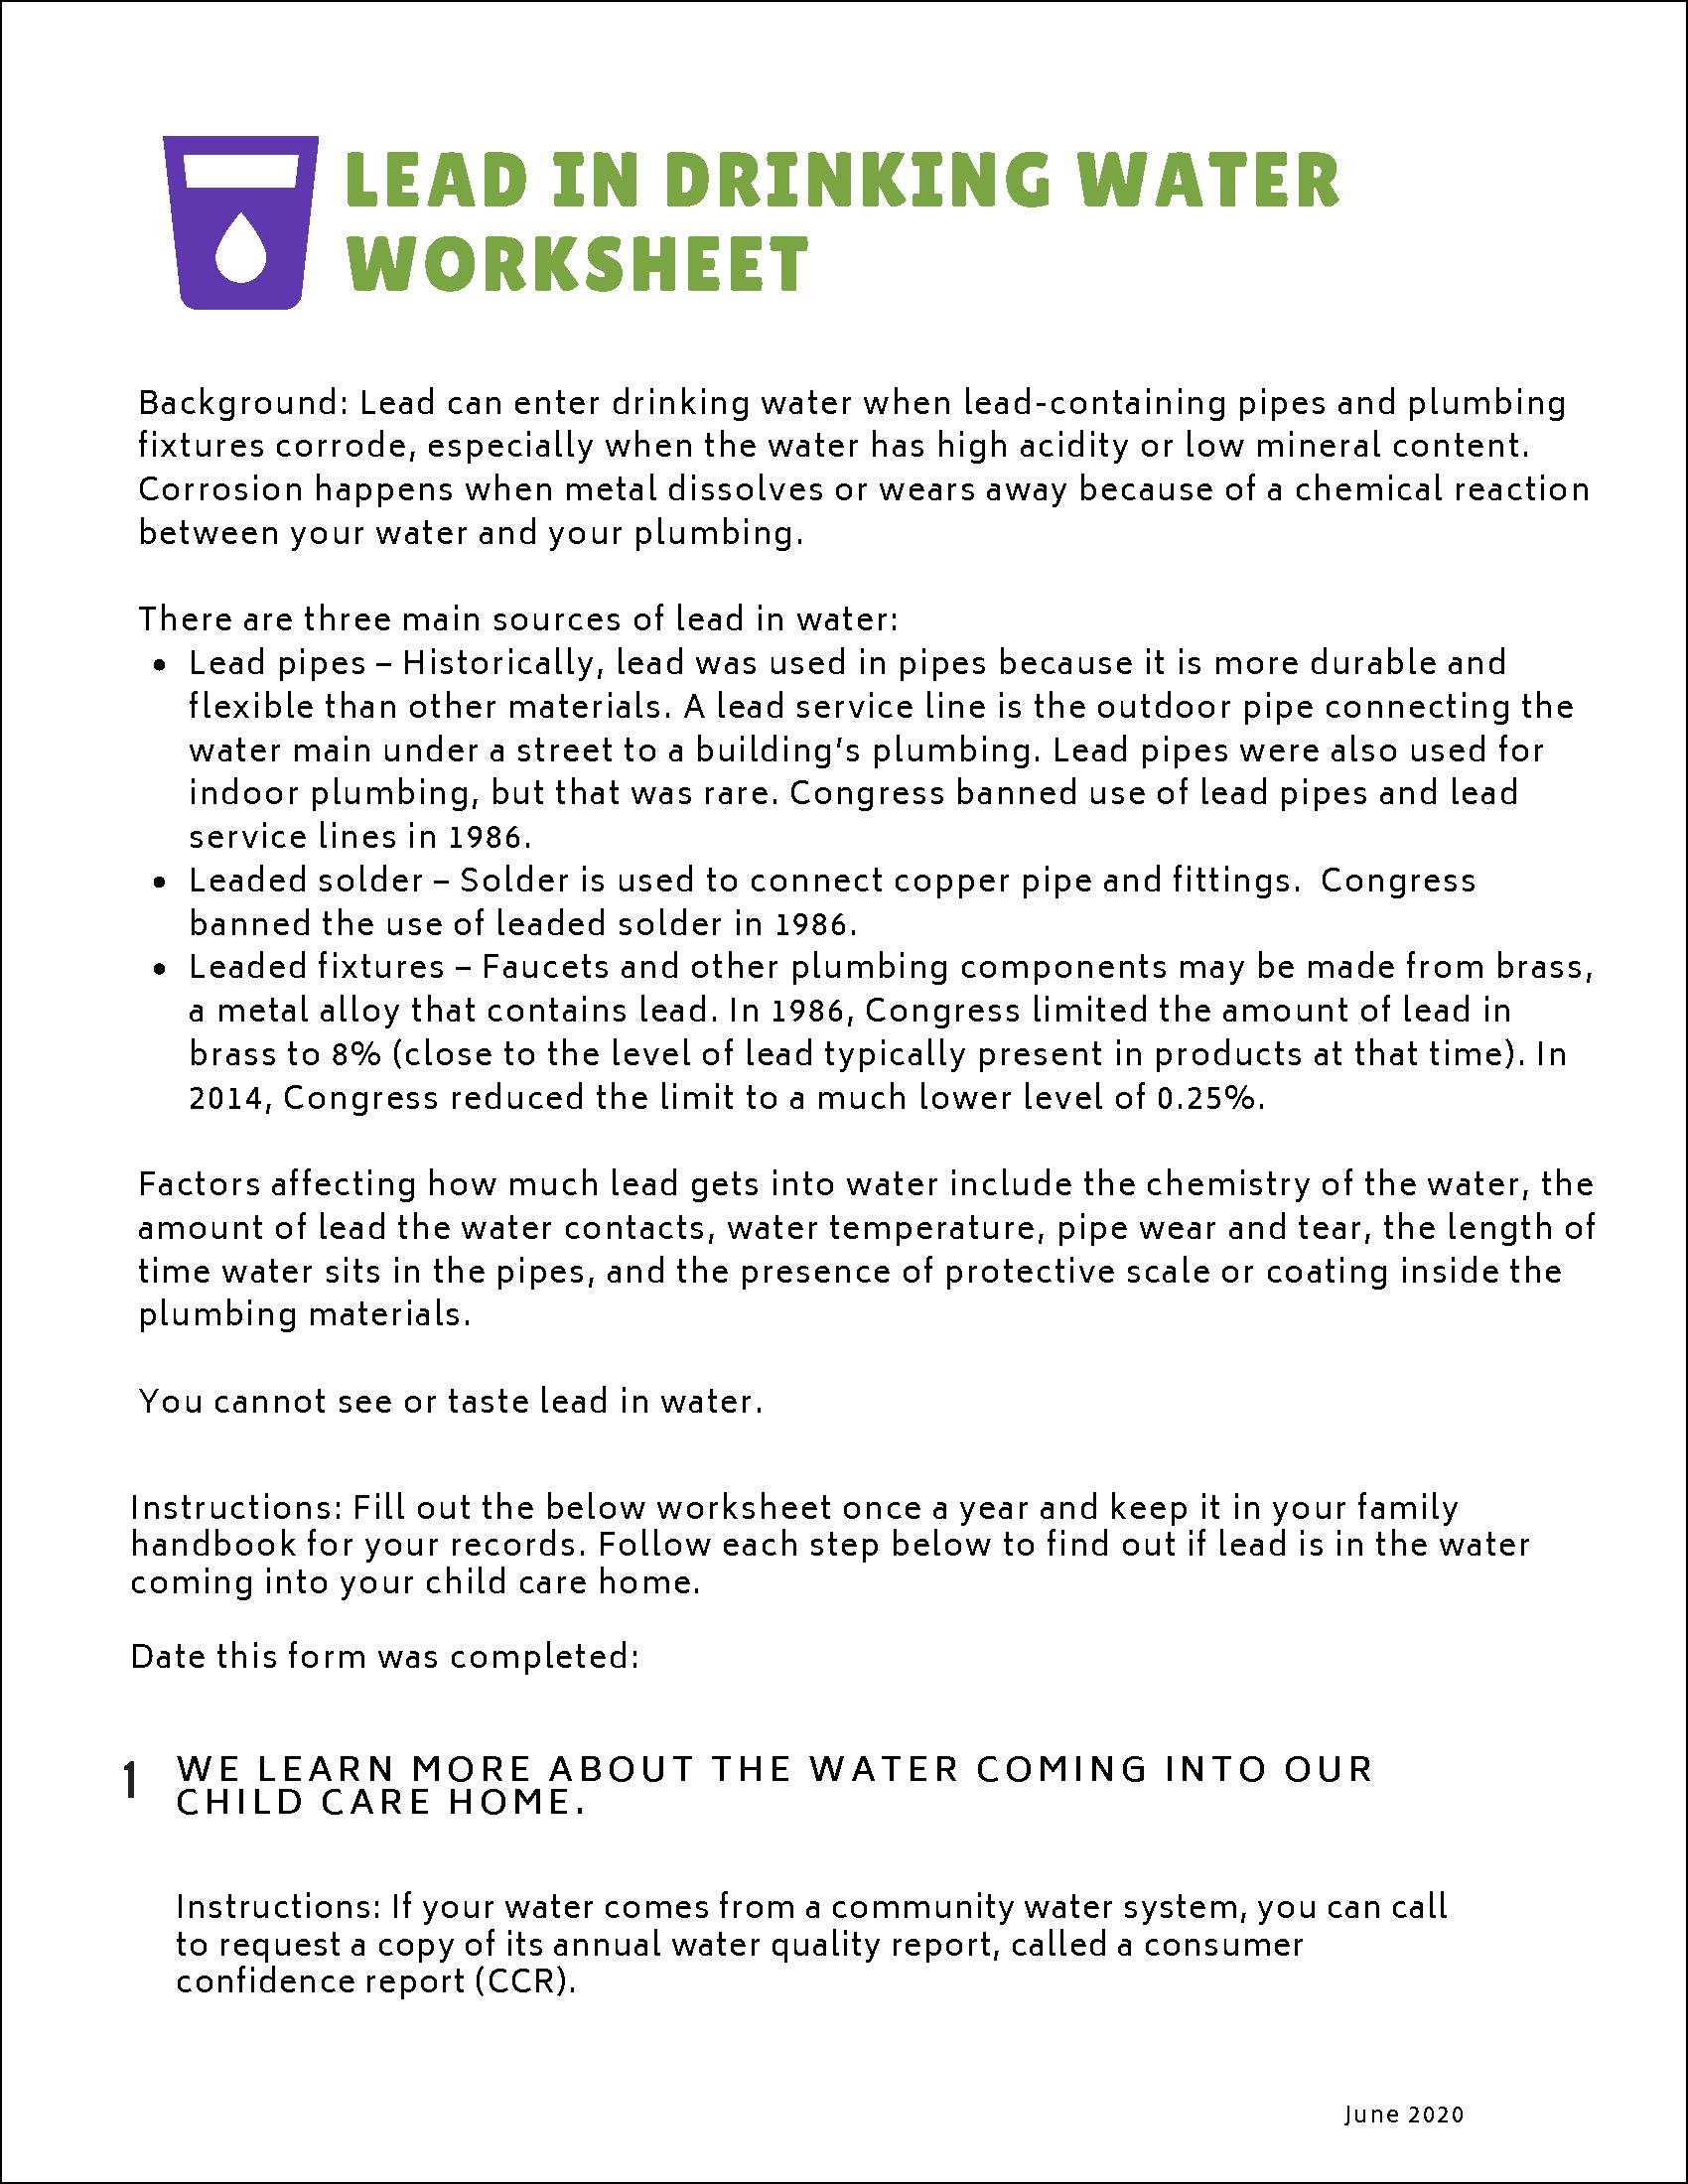 Lead in Drinking Water Worksheet